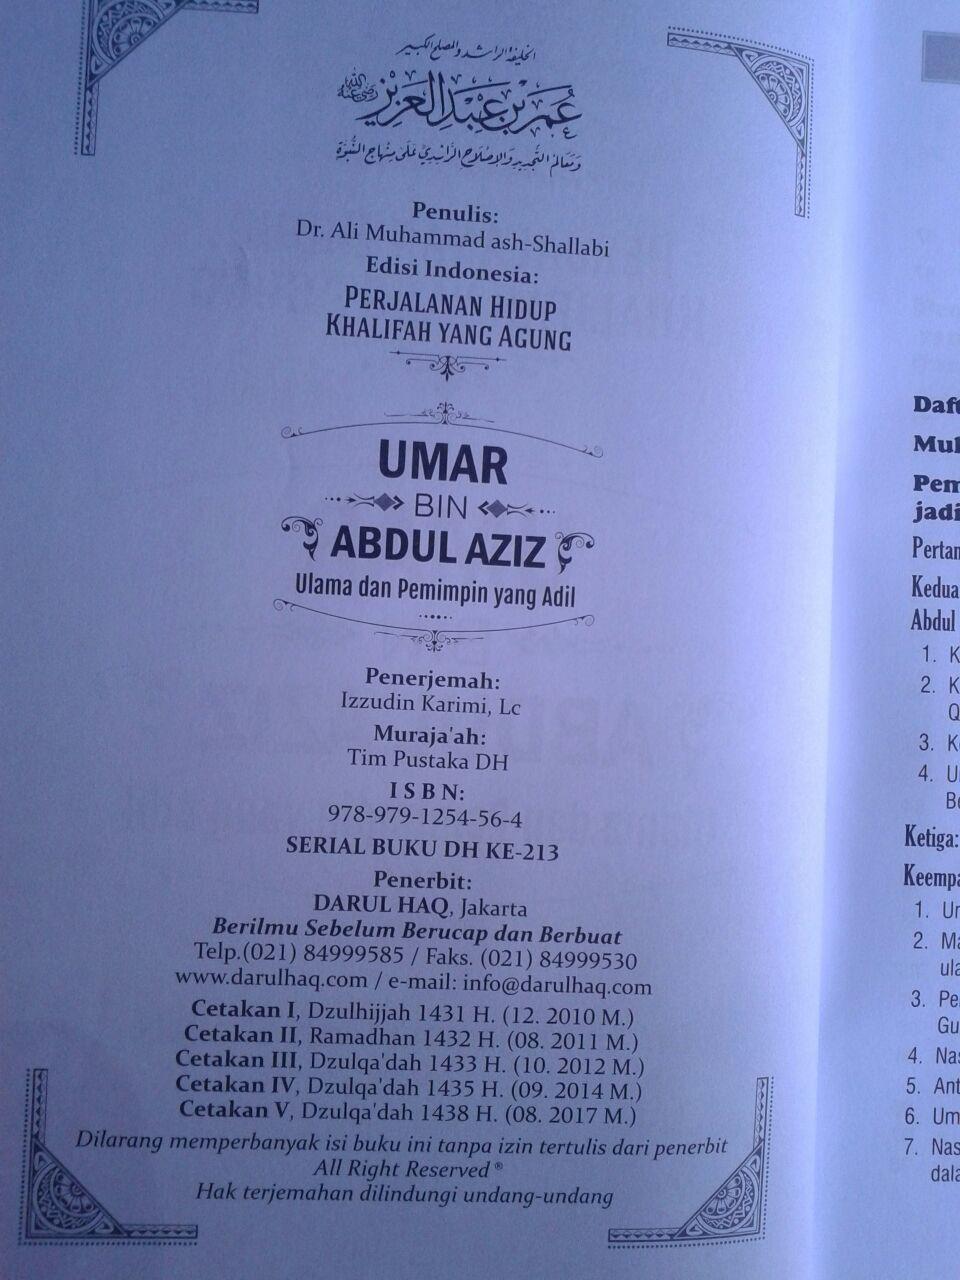 Buku Perjalanan Hidup Khalifah Yang Agung Umar Bin Abdul Aziz Ulama Dan Pemimpin Yang Adil isi